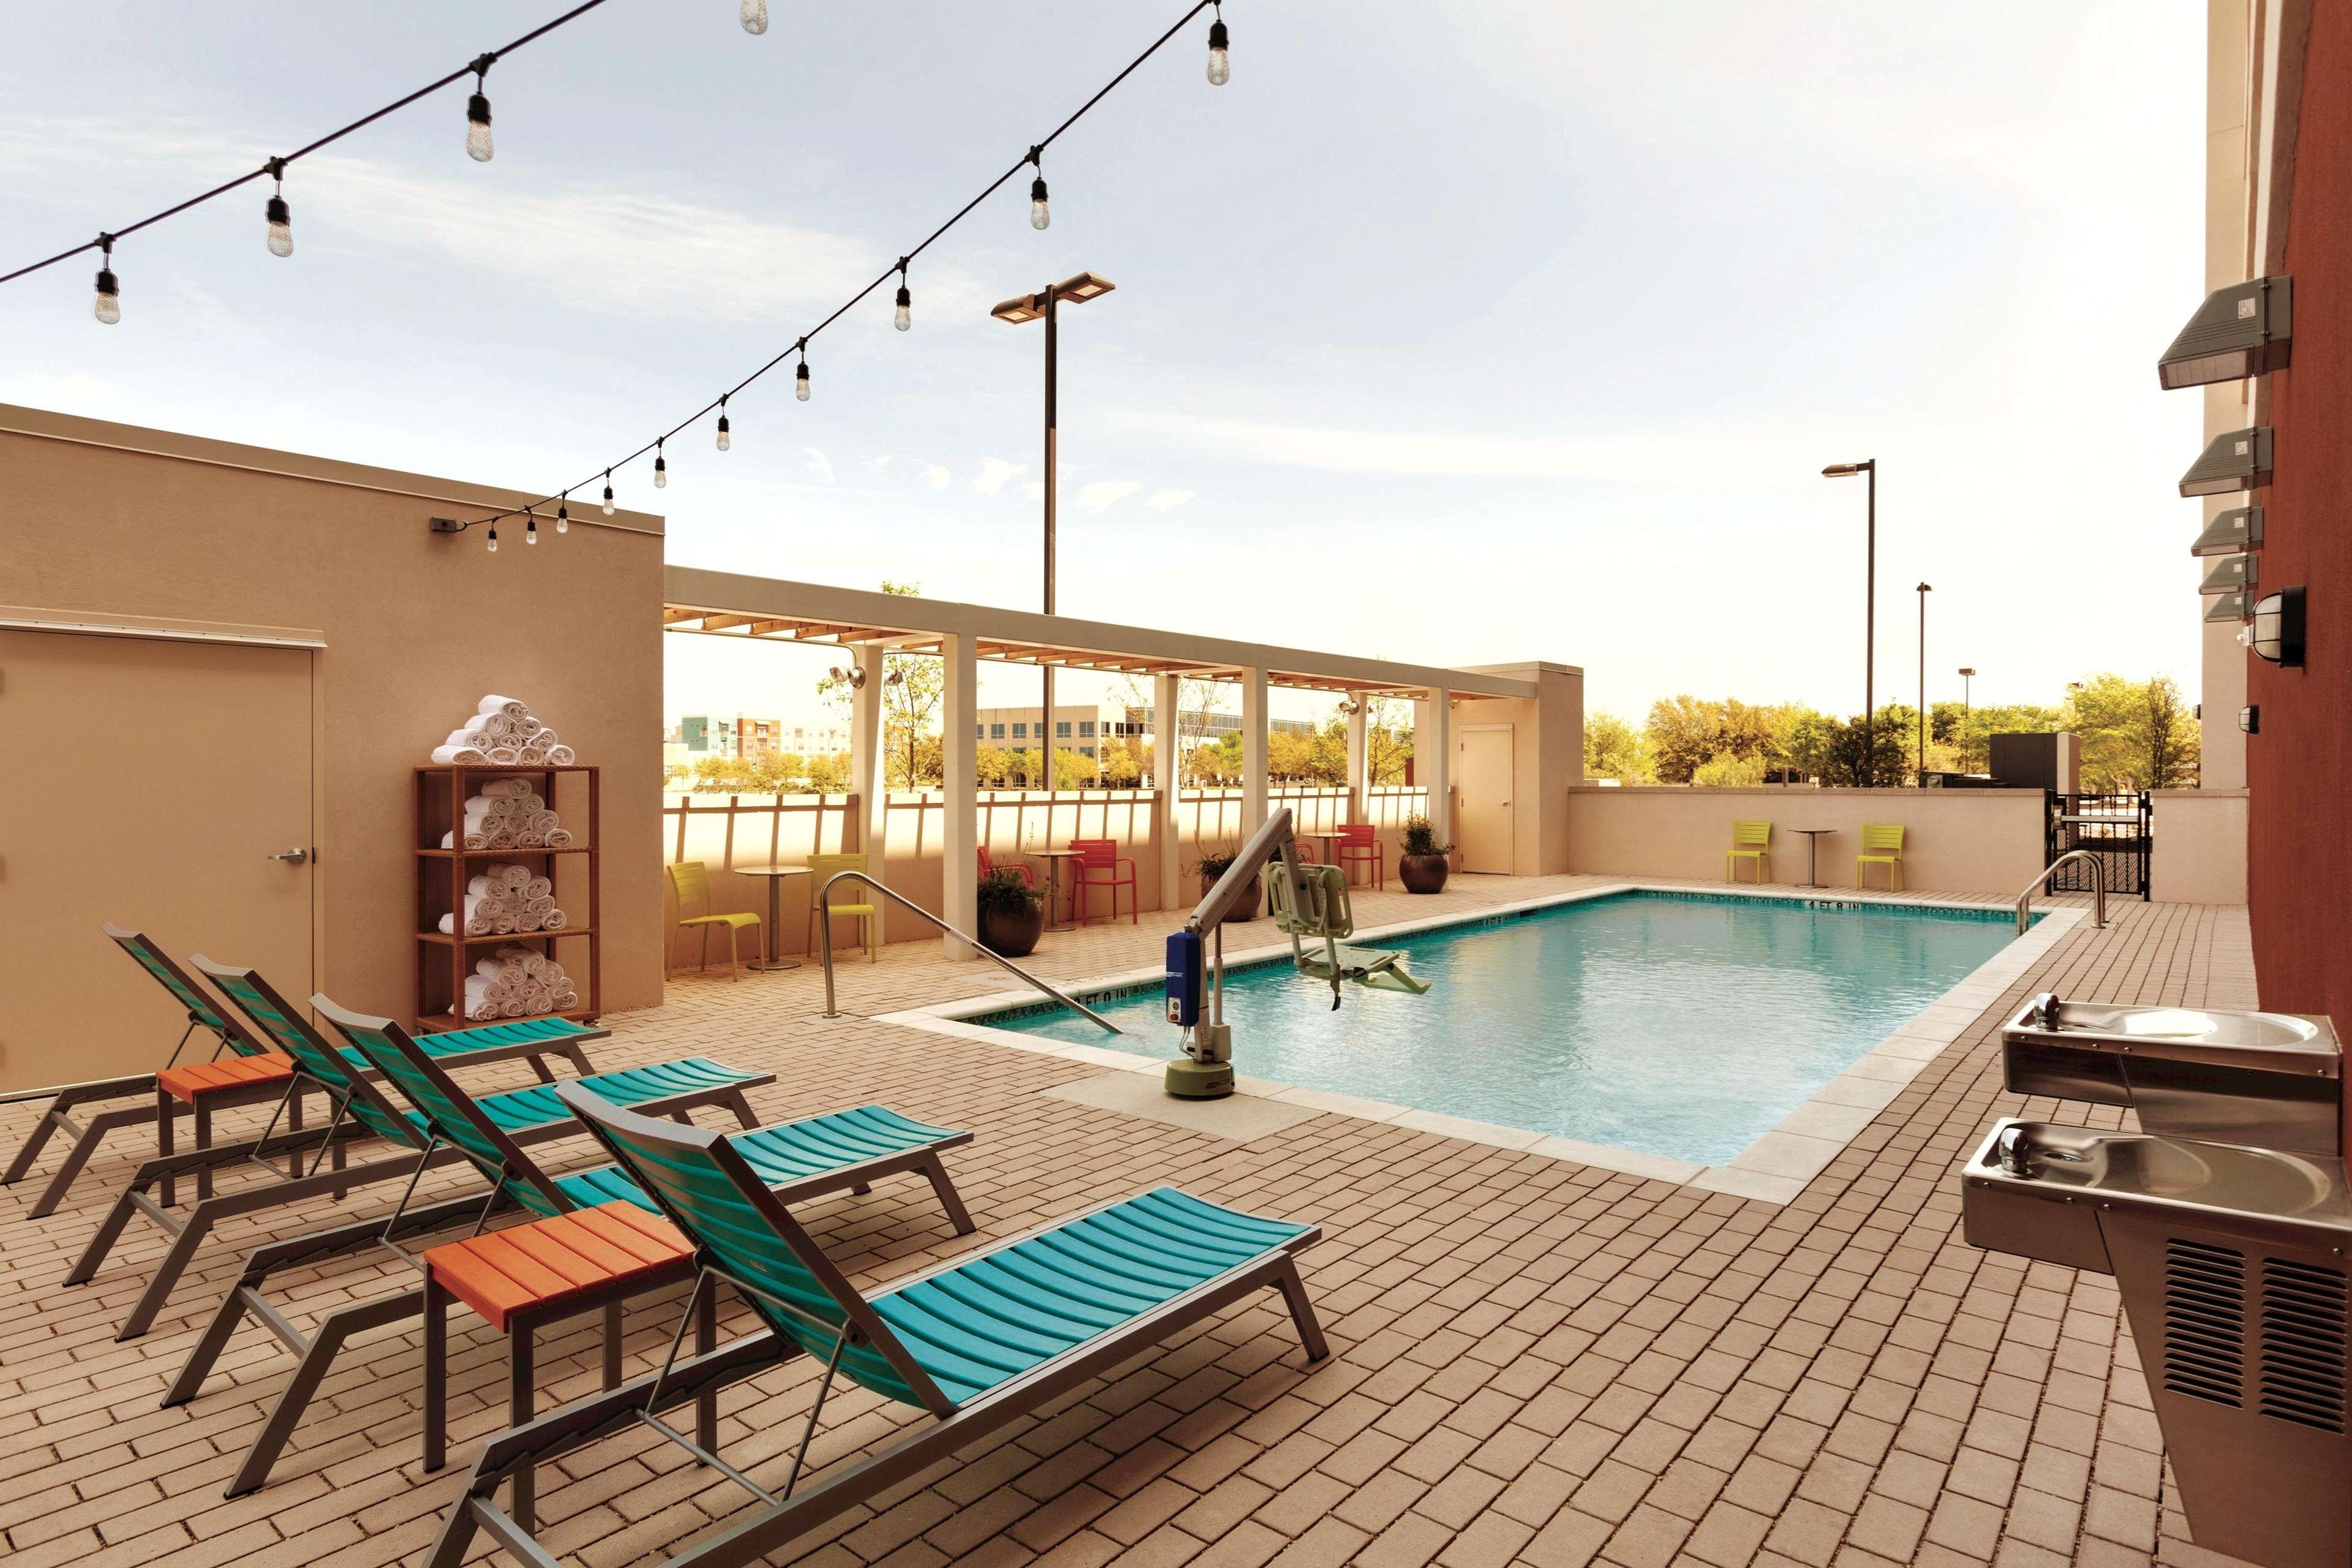 Home2 Suites by Hilton Austin Round Rock image 4